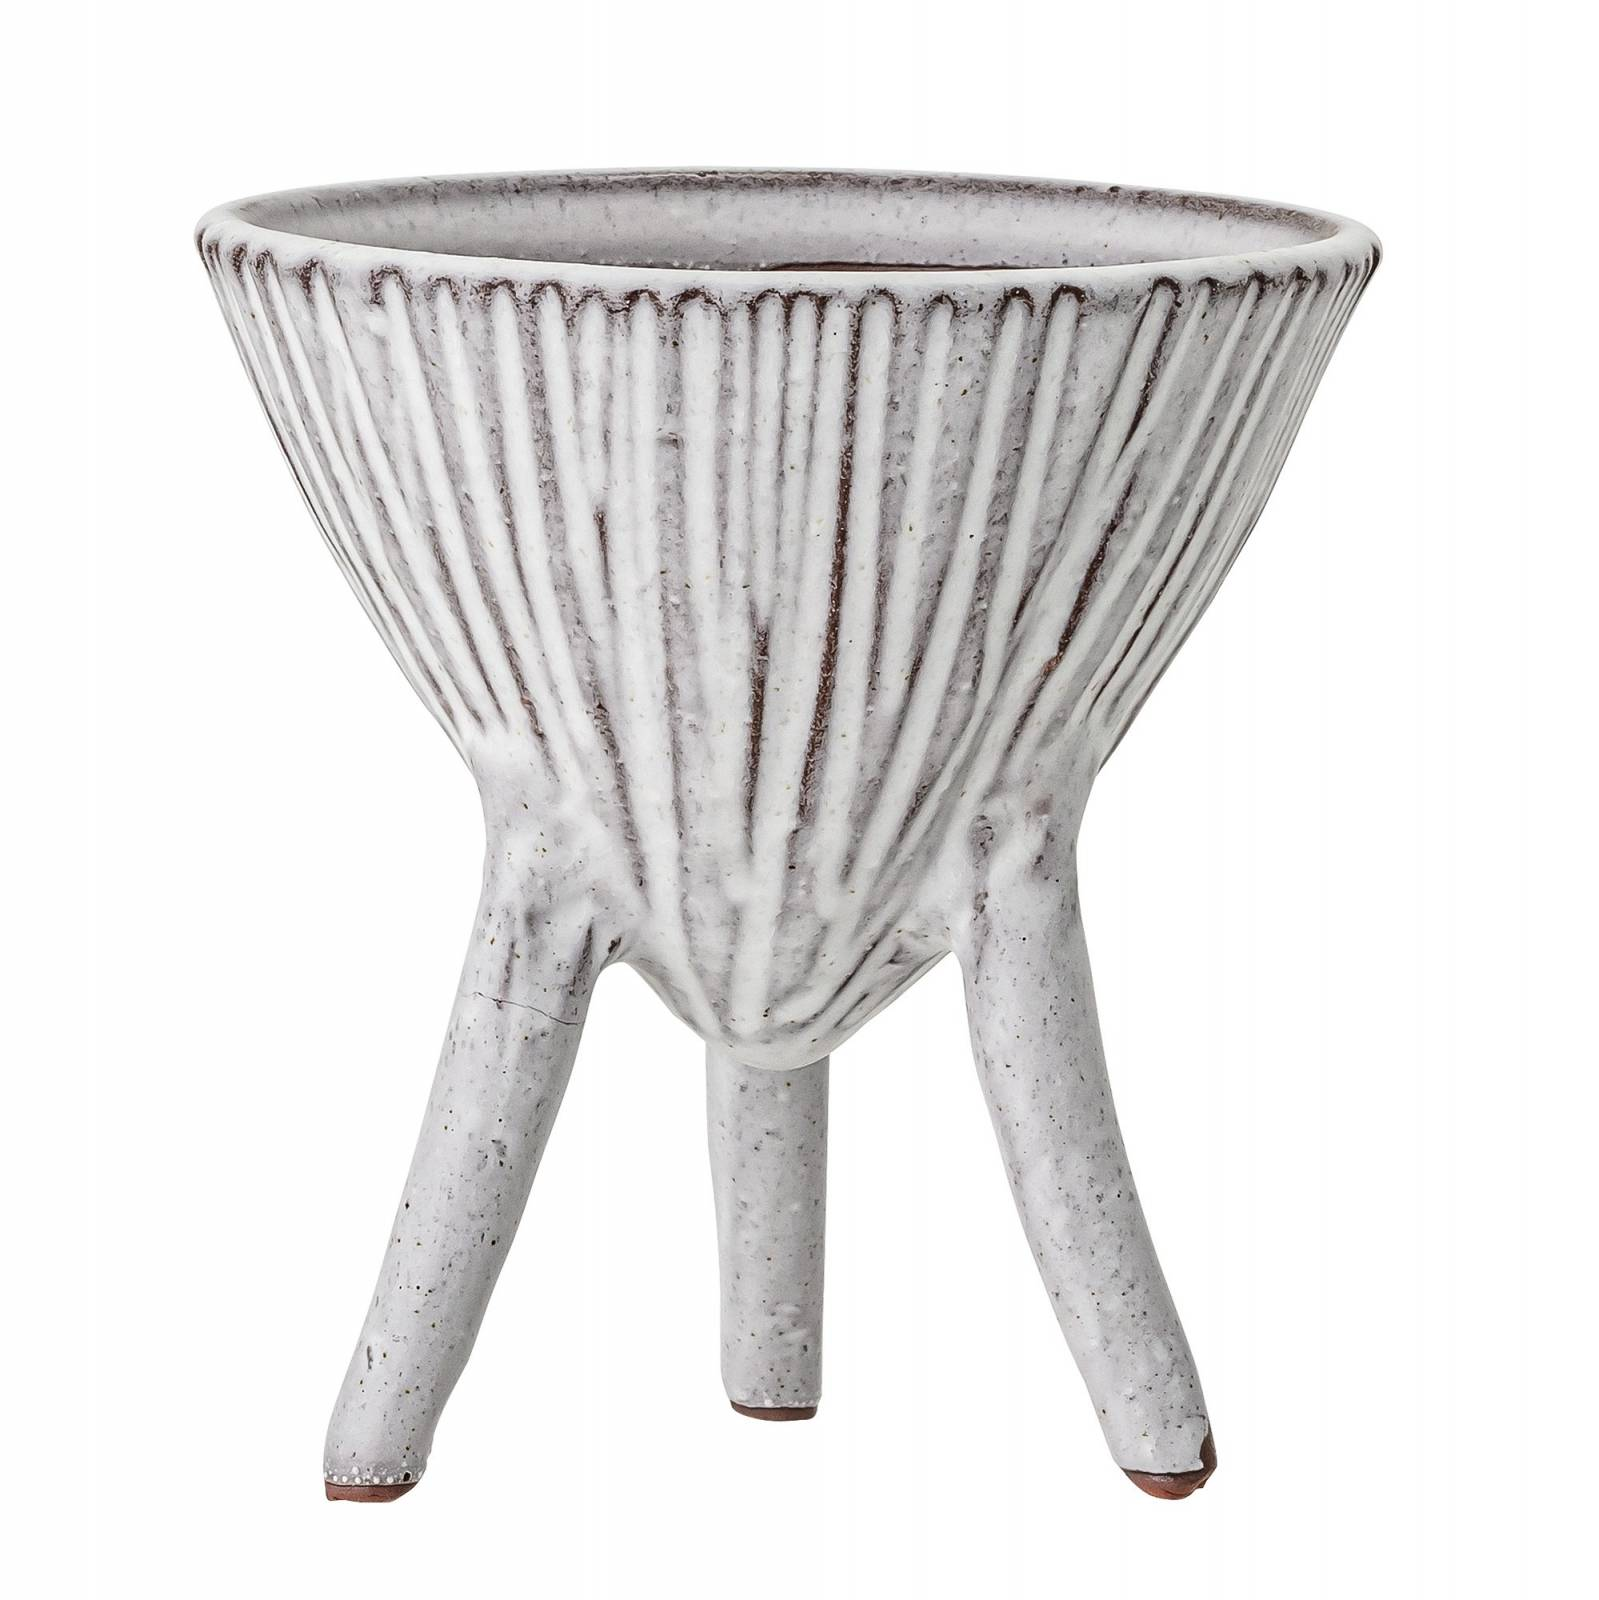 Striped White Terracotta Plant Pot On Tripod Legs